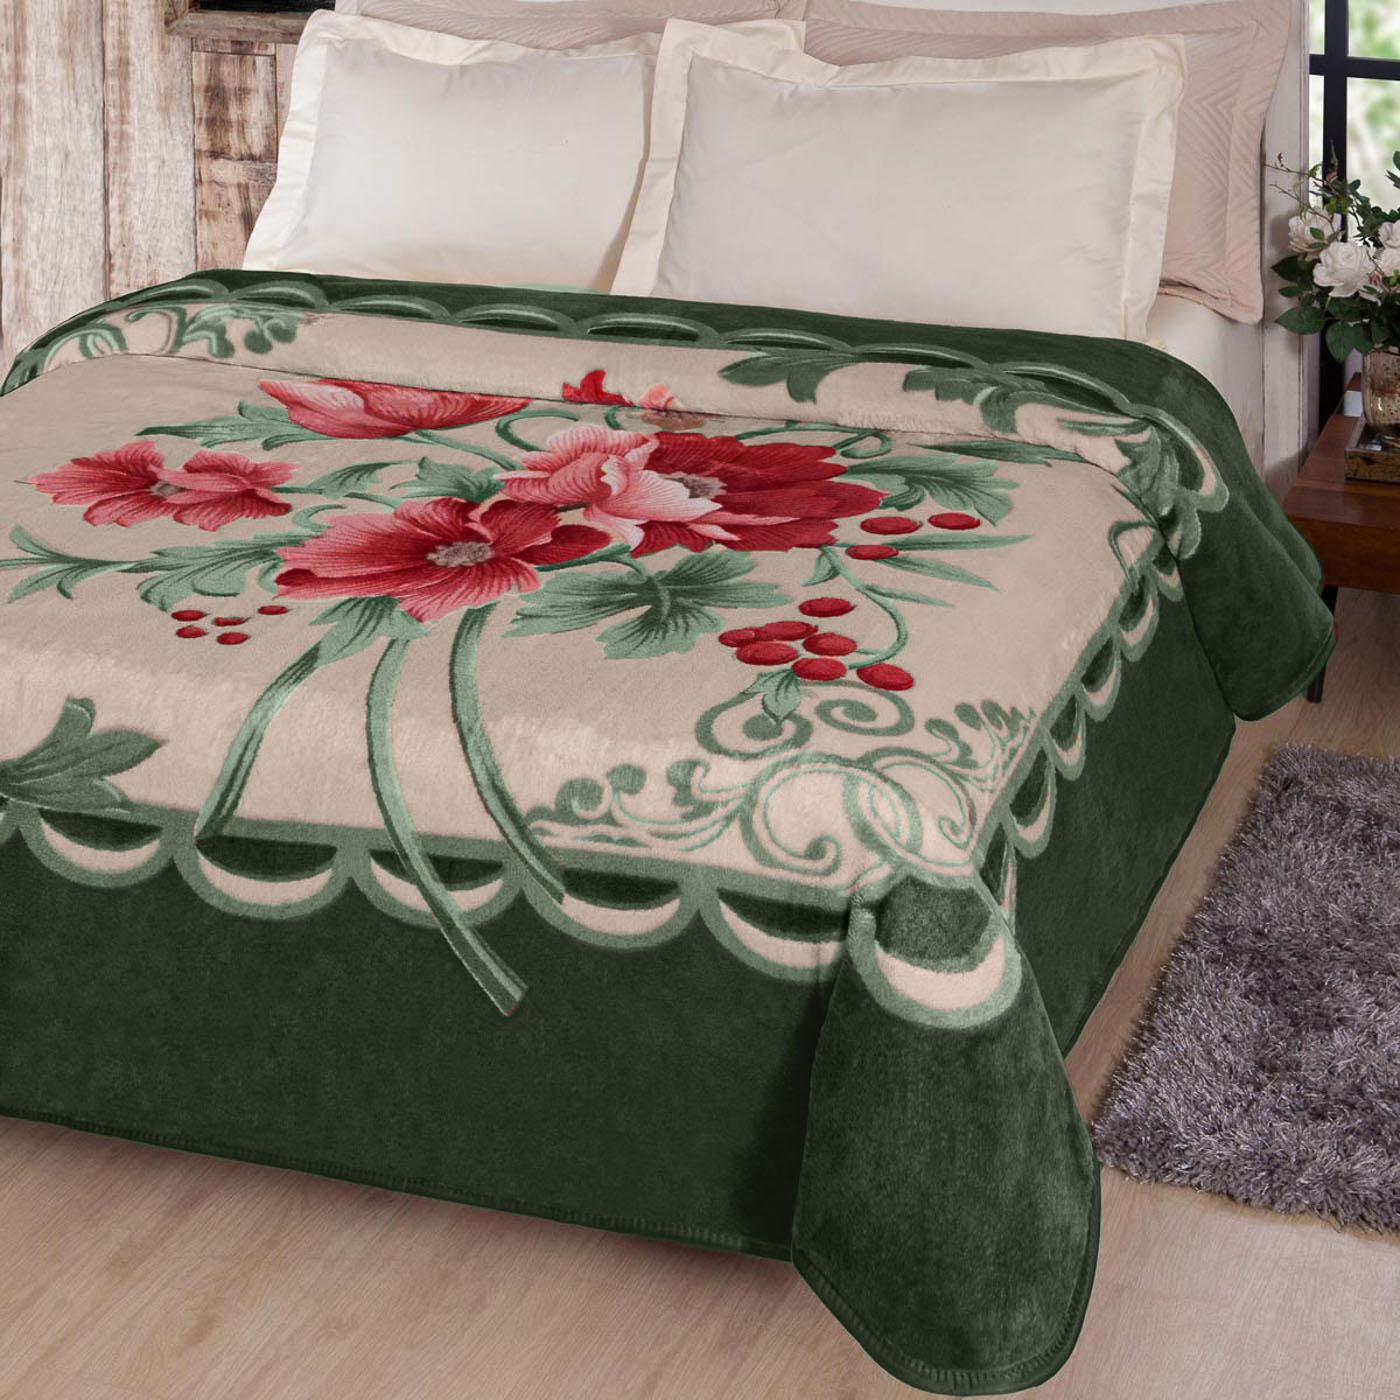 Cobertor Jolitex Kyor Plus King 2,20x2,40m Fiore Verde